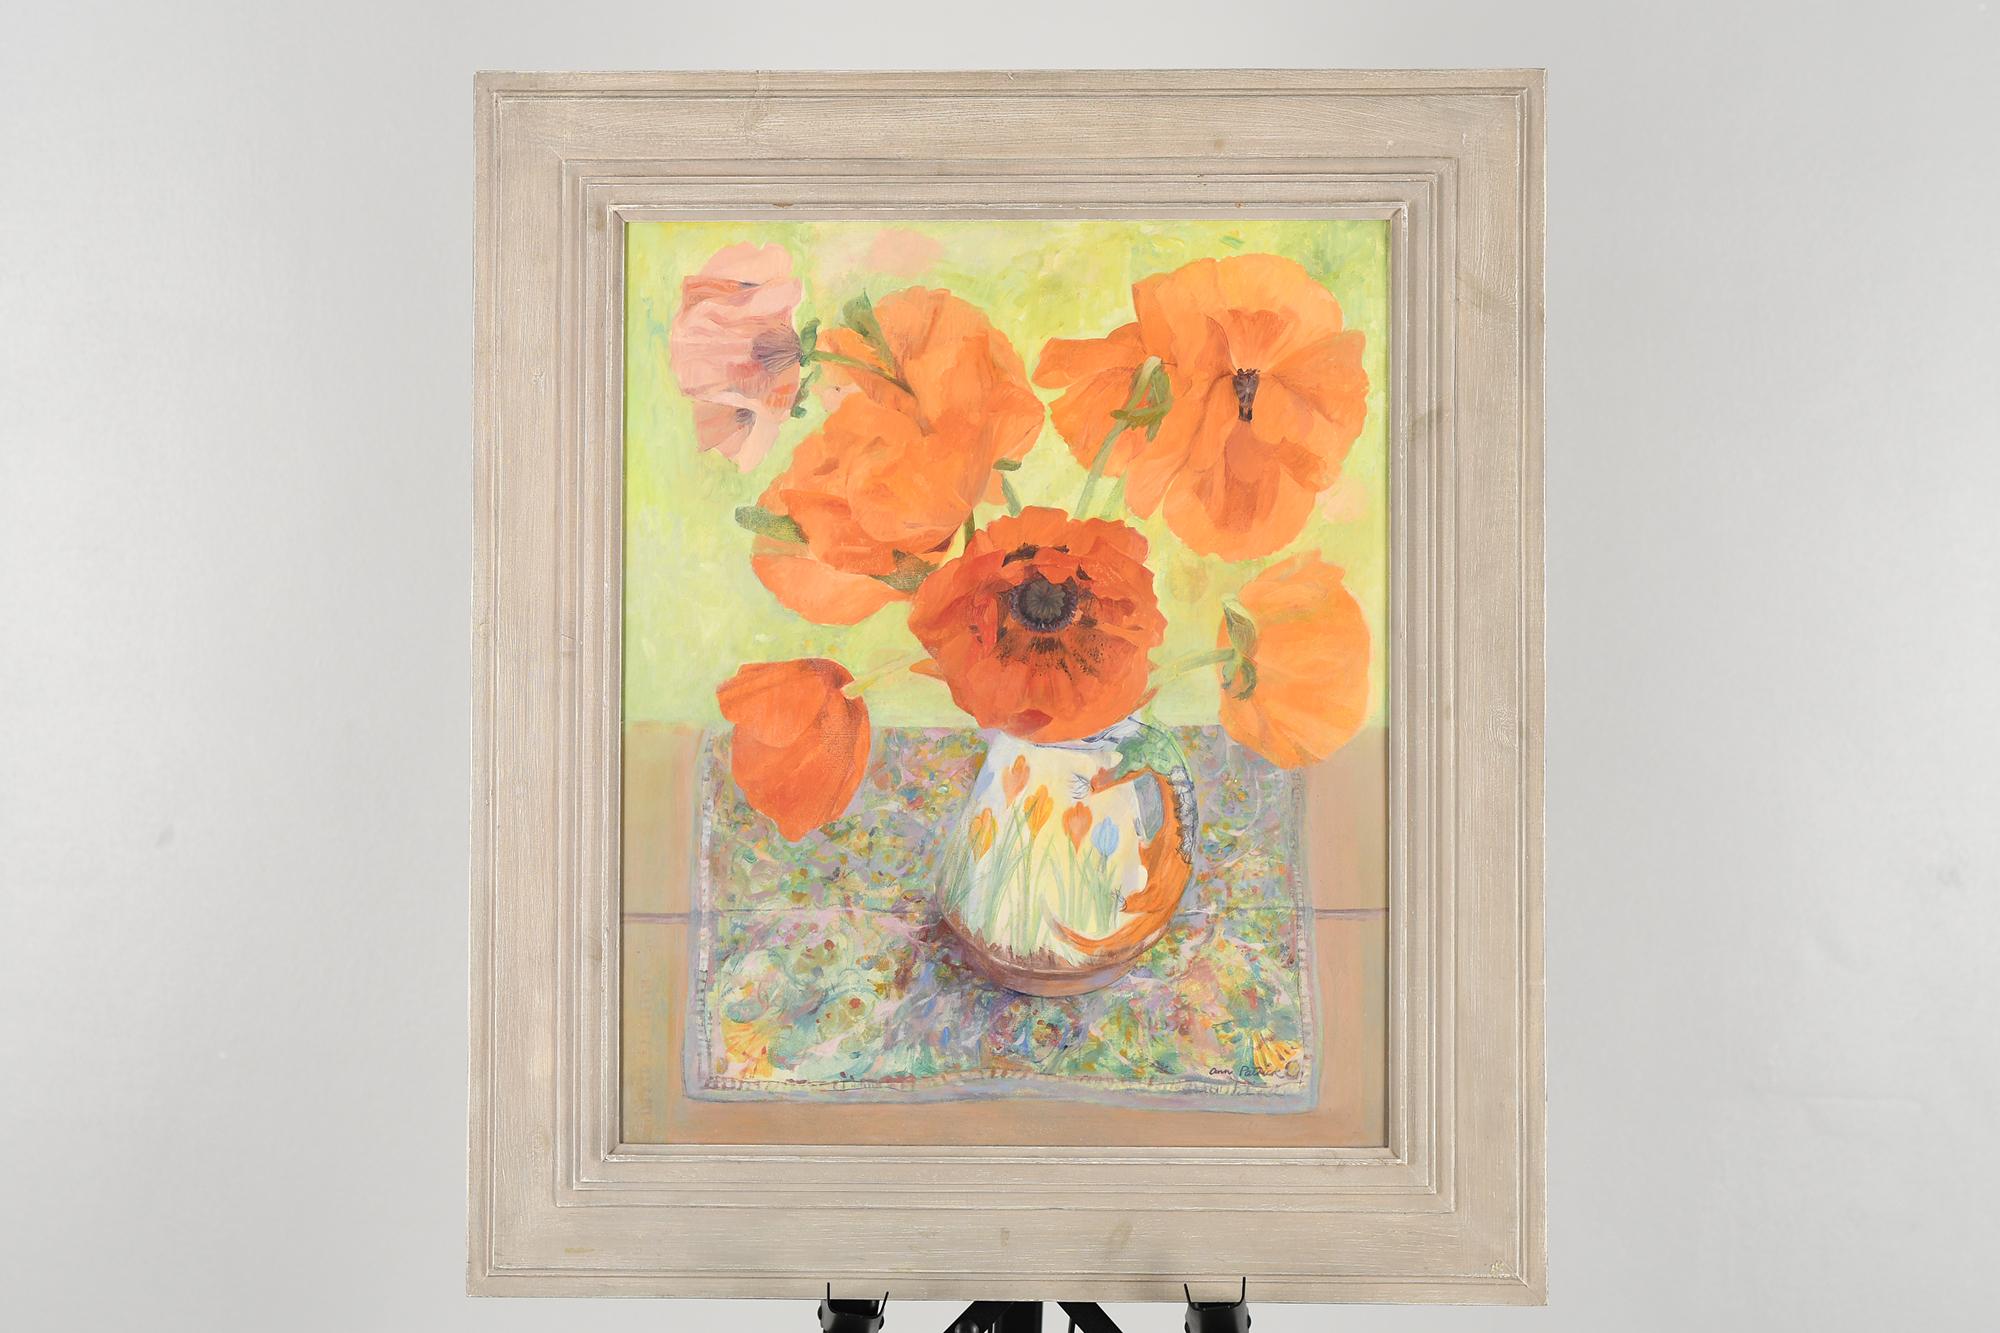 Original Oil Painting by Scottish Artist Ann Patrick. - Image 3 of 9